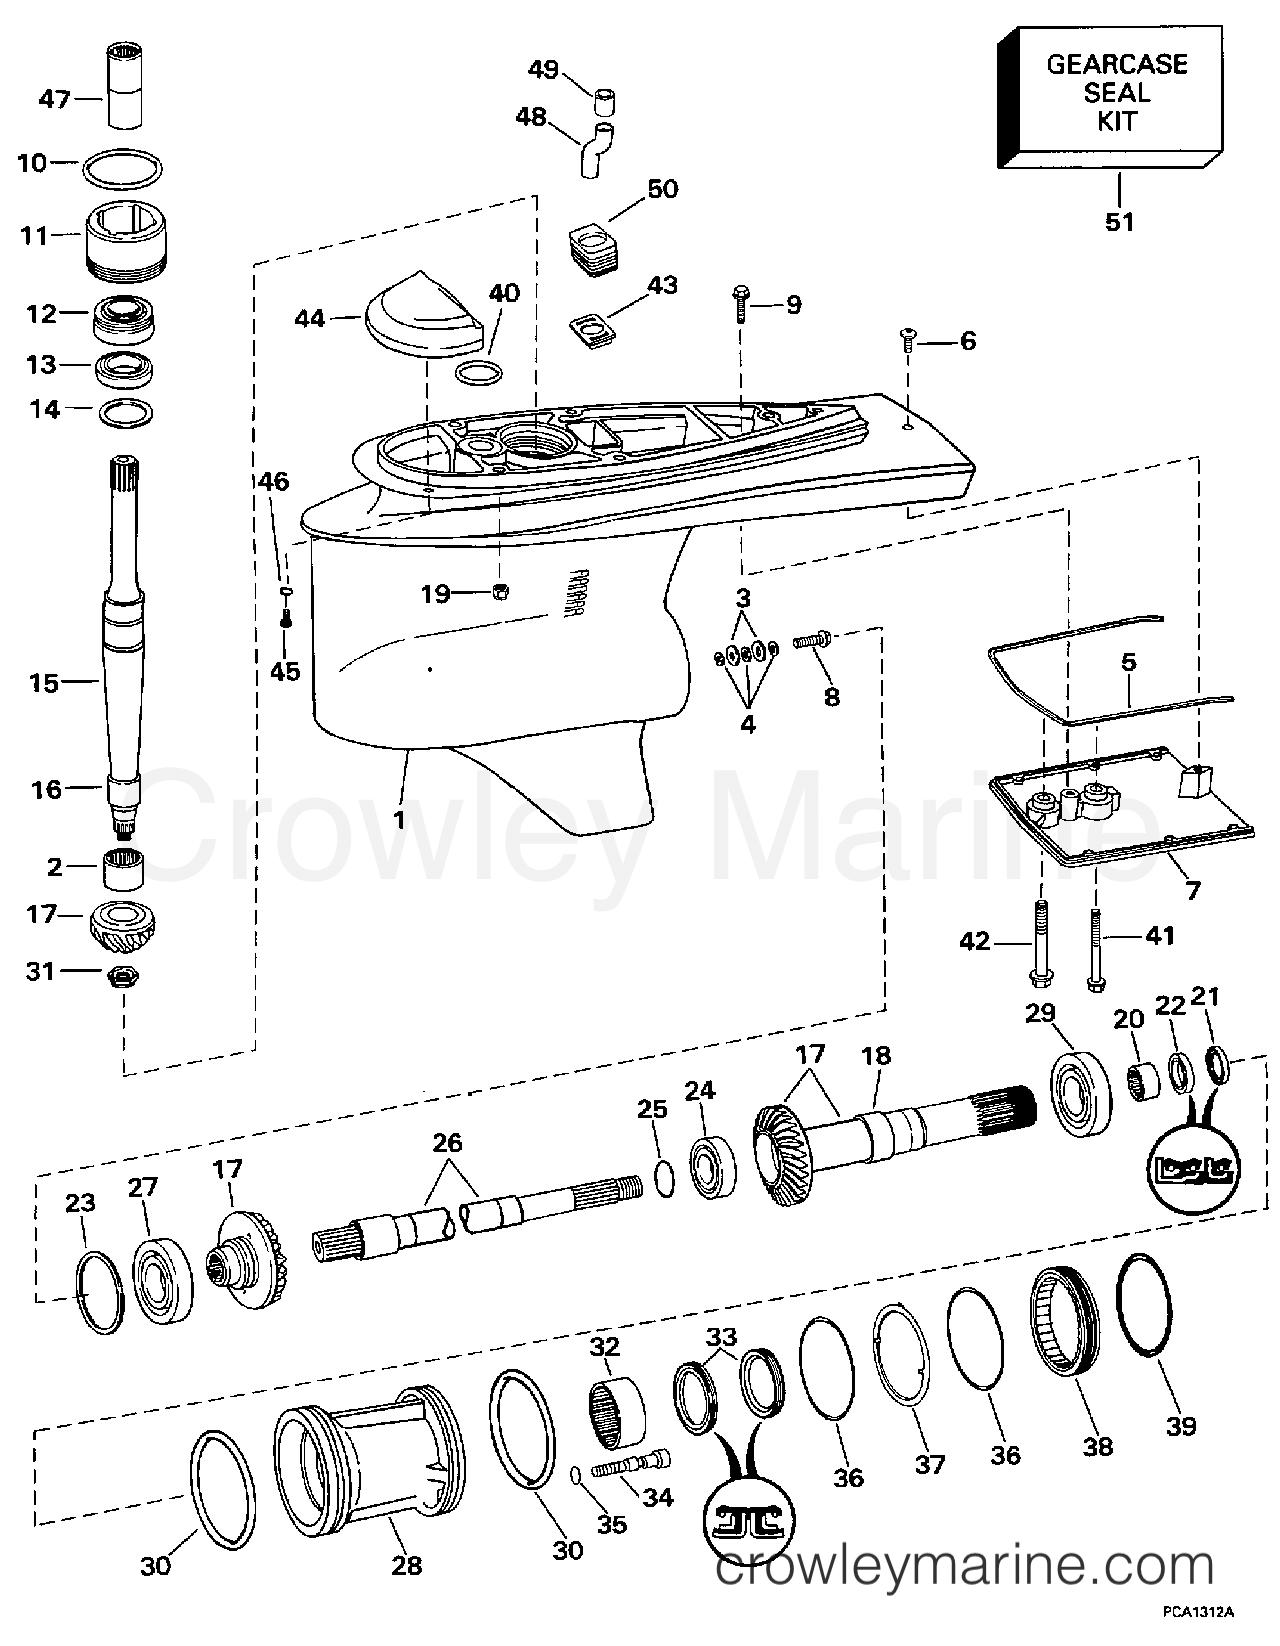 1997 OMC Stern Drive 7.4 - 744FPLKD LOWER GEARCASE - DUAL PROP section